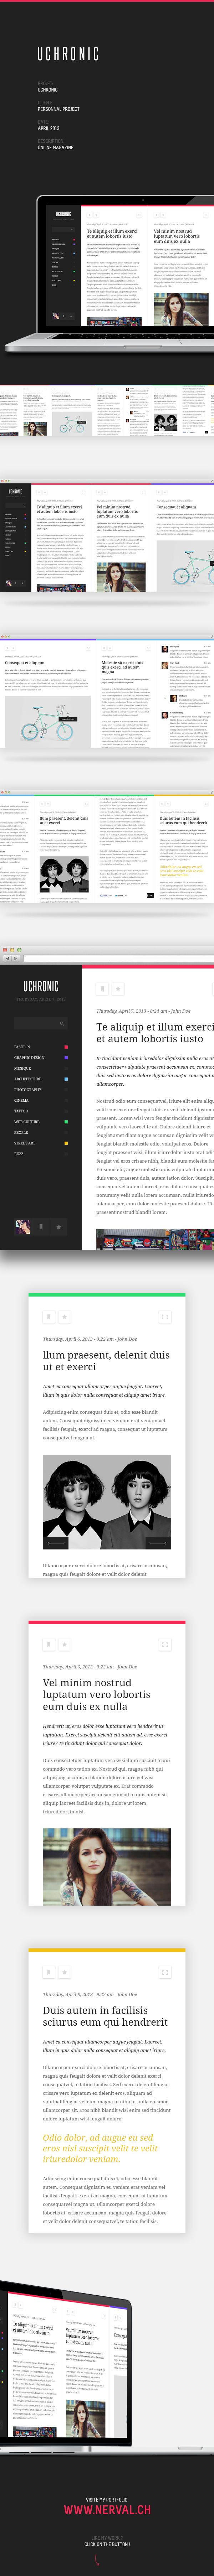 Uchronic by Pierre Georges, via Behance #flatdesign #webdesign #color #photography #typography #ResponsiveDesign #Web #UI #UX #WordPress #Resposive Design #Website #Graphics